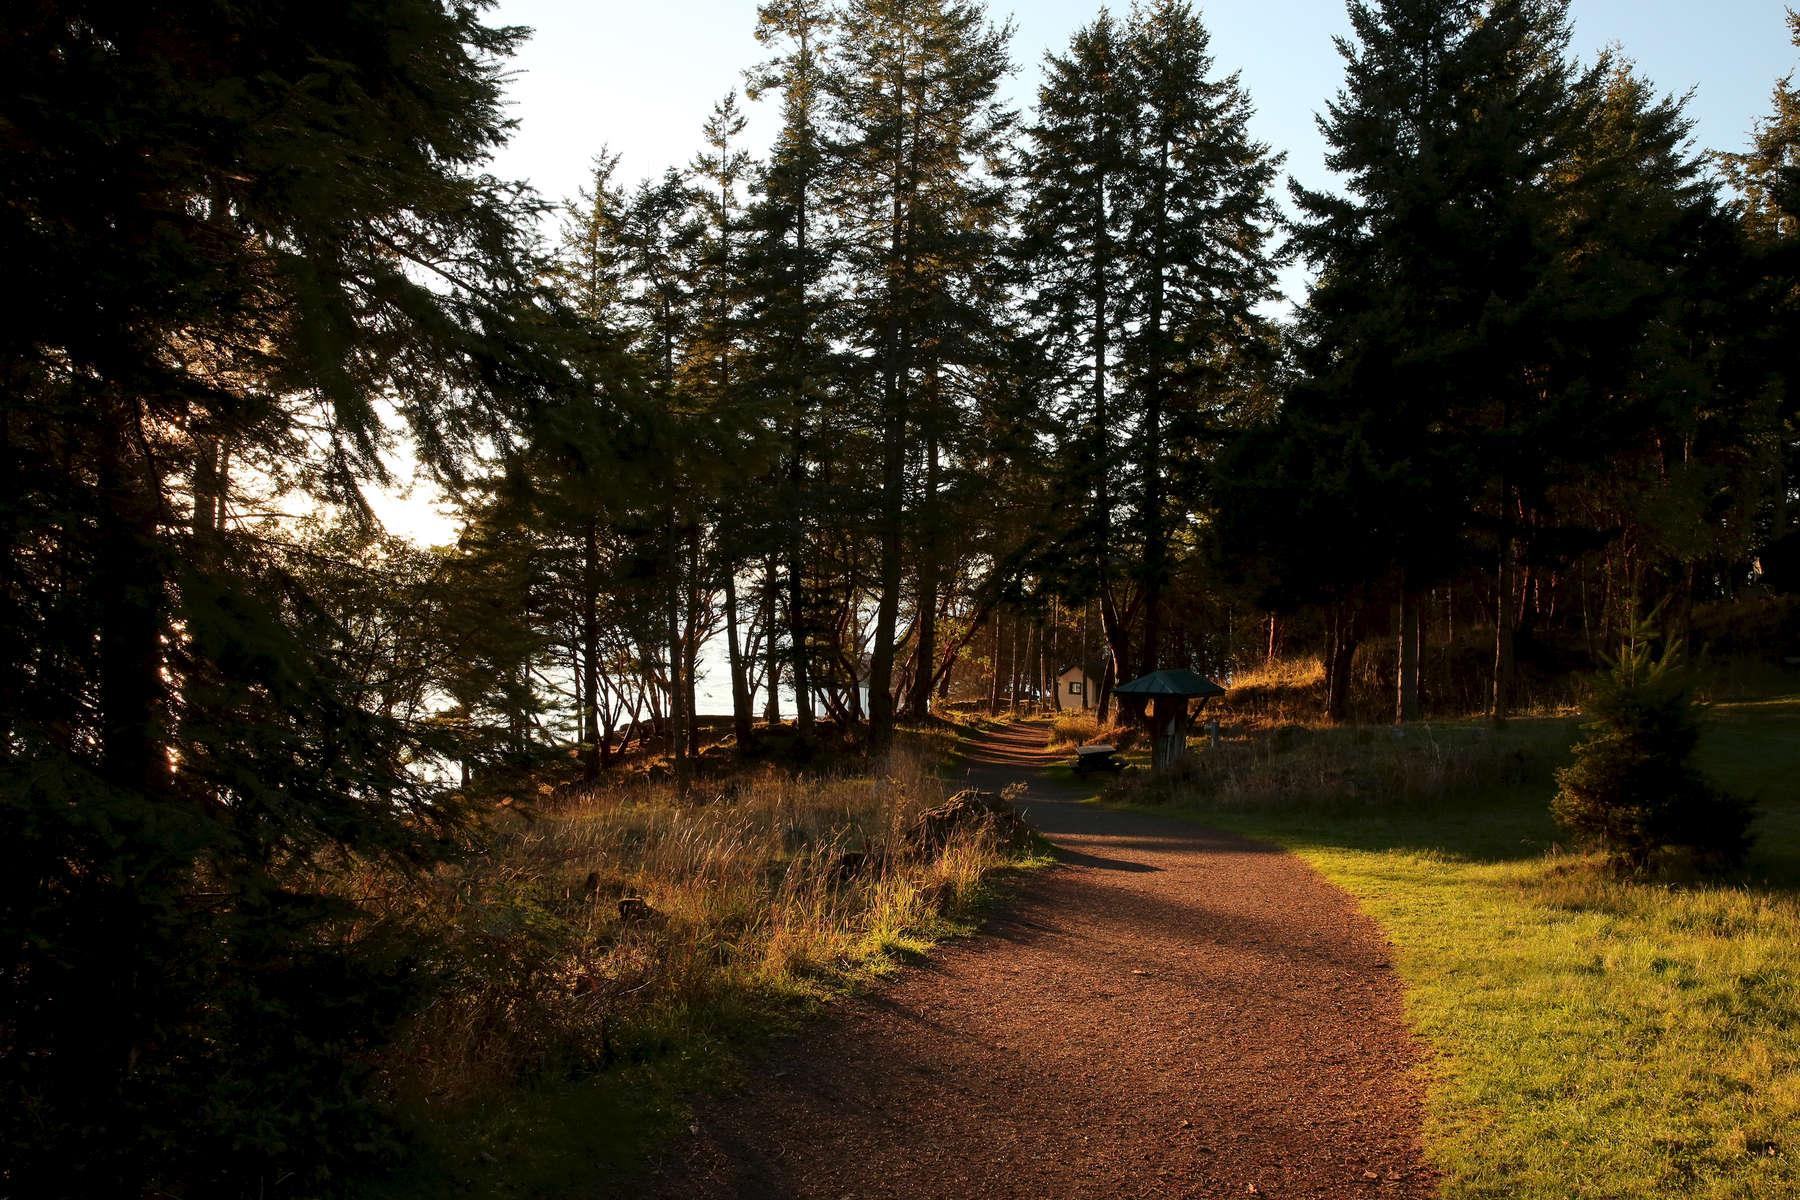 Morning light illuminates the path at Lime Kiln Point State Park.